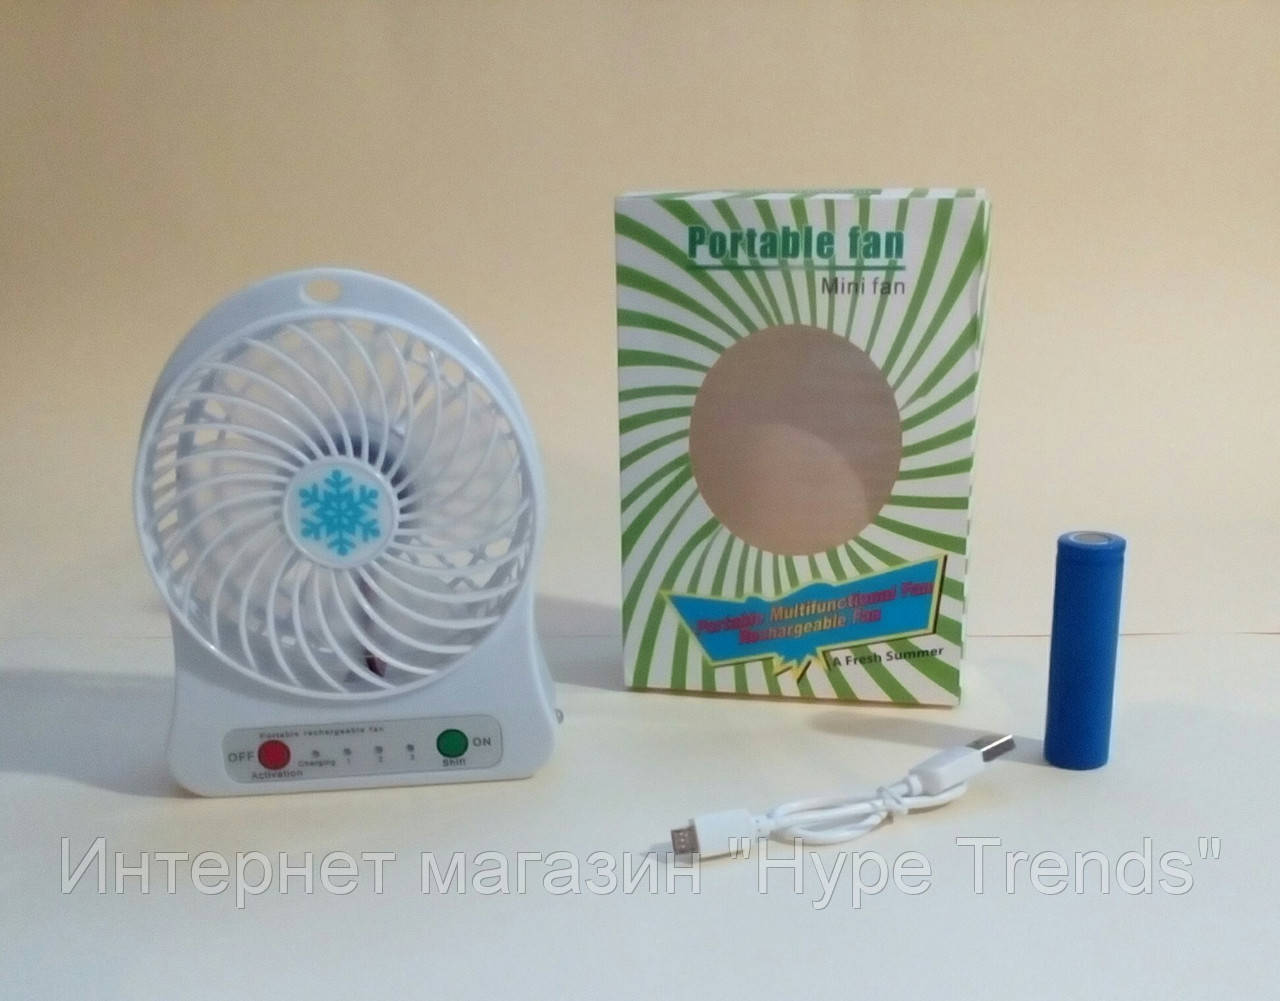 Портативный мини вентилятор с аккумулятором 18650 mAh